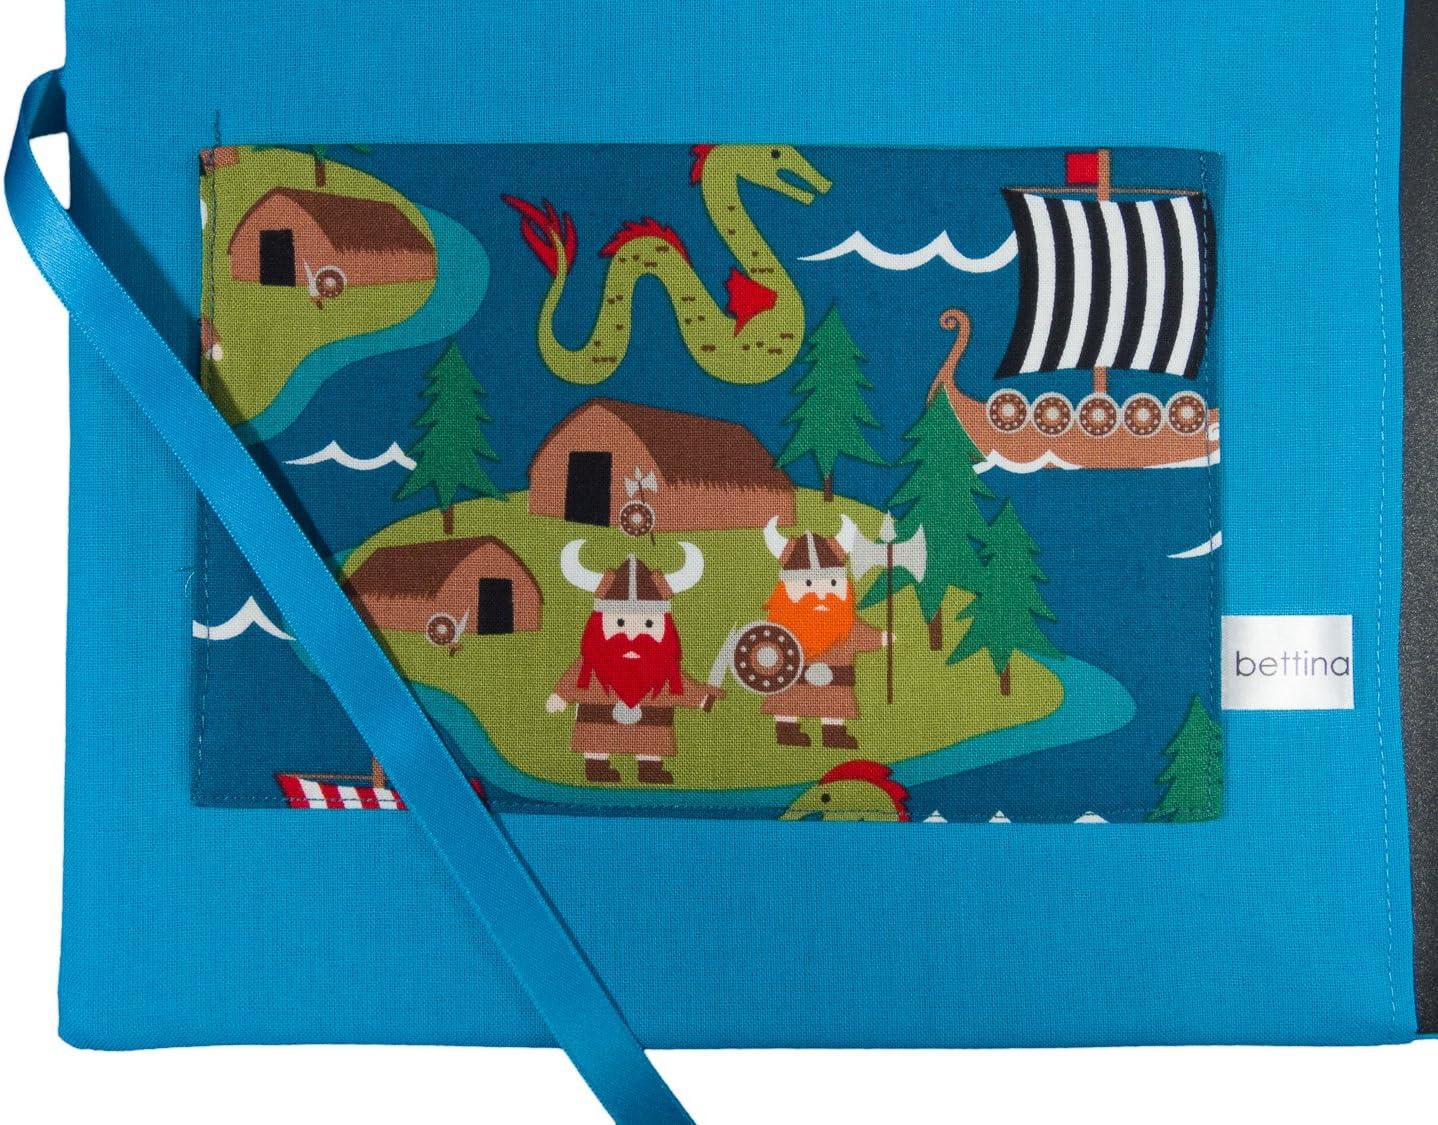 Zeugnismappe DIN A4 bettina bruder innen t/ürkis innen 30 Sichth/üllen Wikinger blau bunt